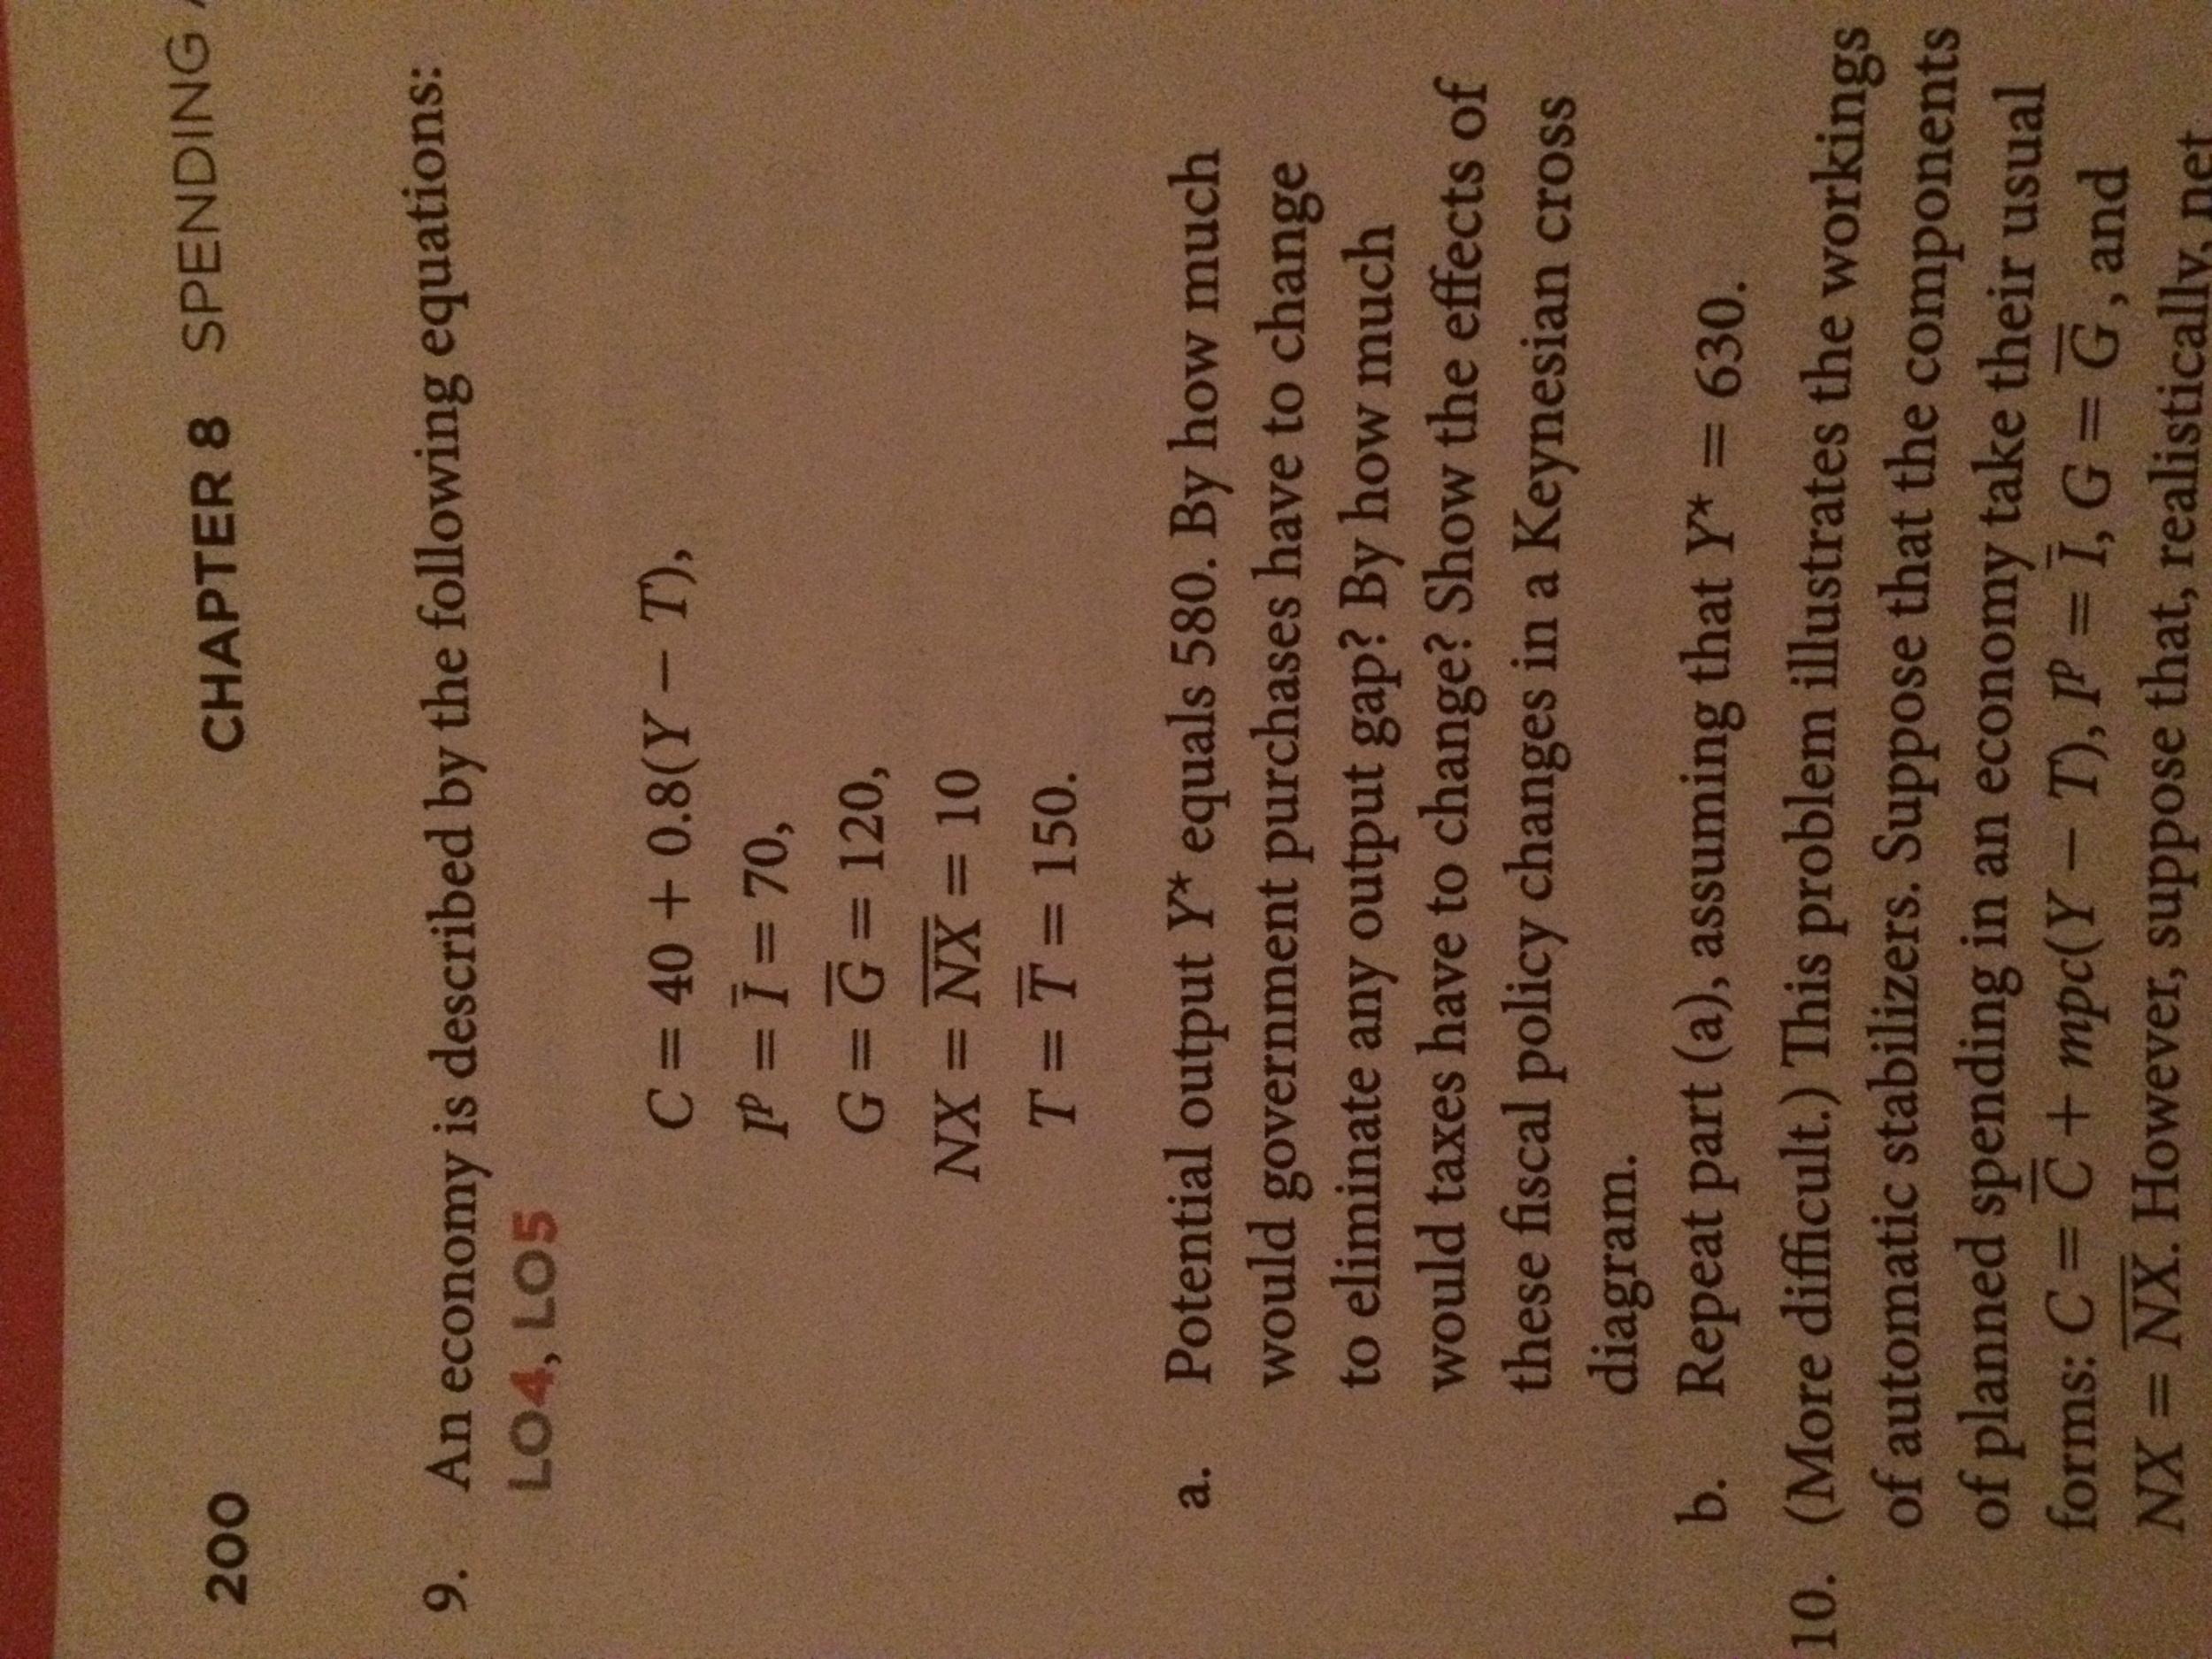 Principles of macroeconomics by frank 4th edition | ebay.